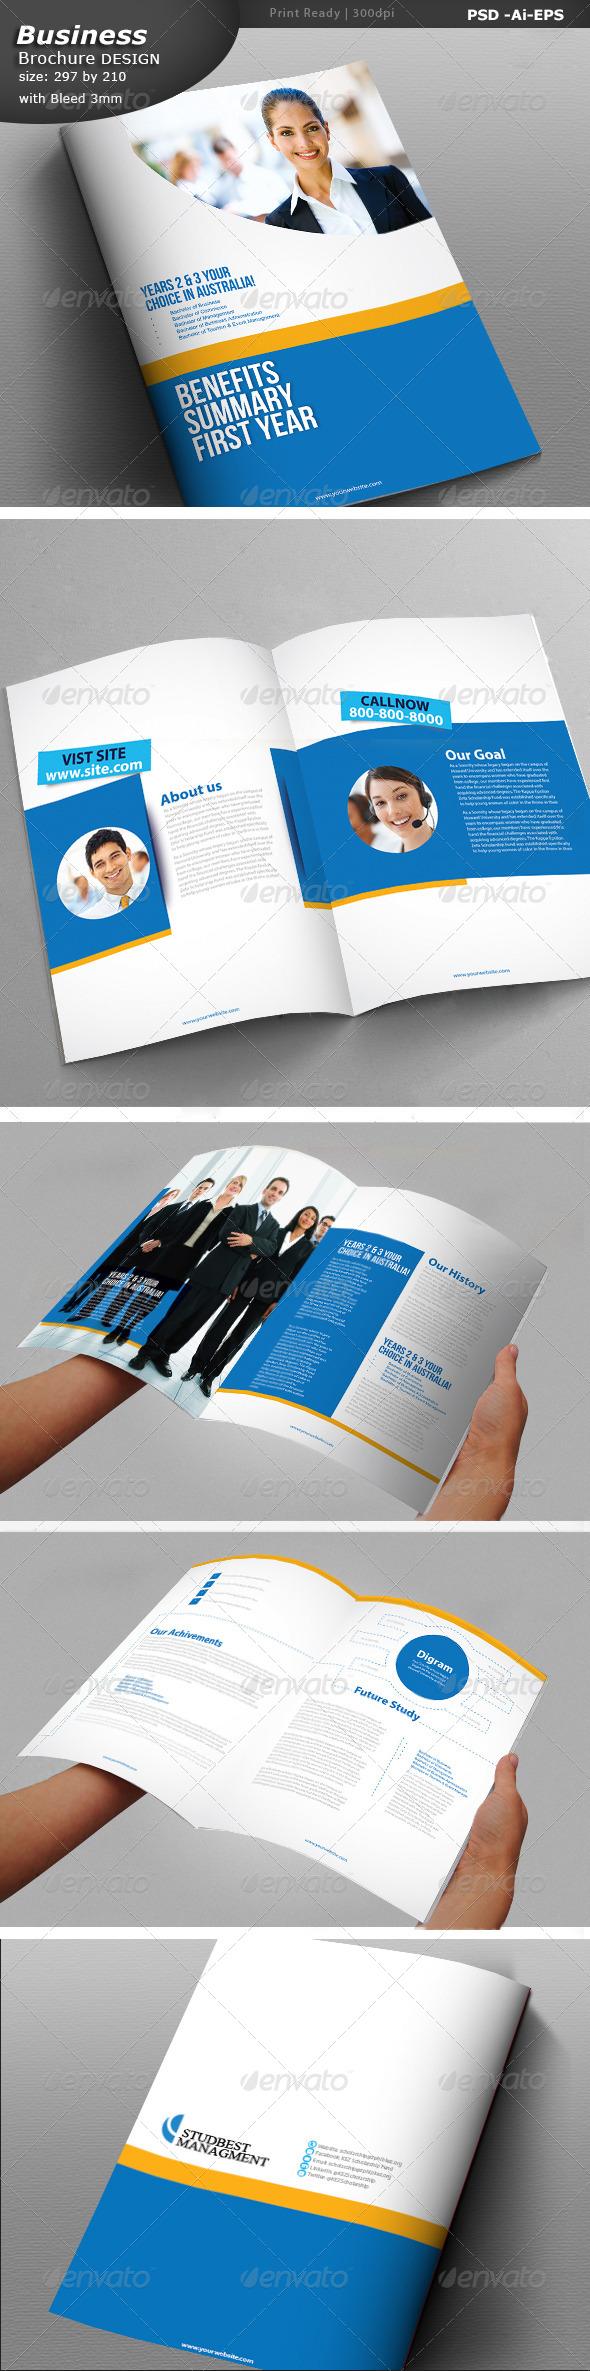 GraphicRiver Business Brochure Design 6913055